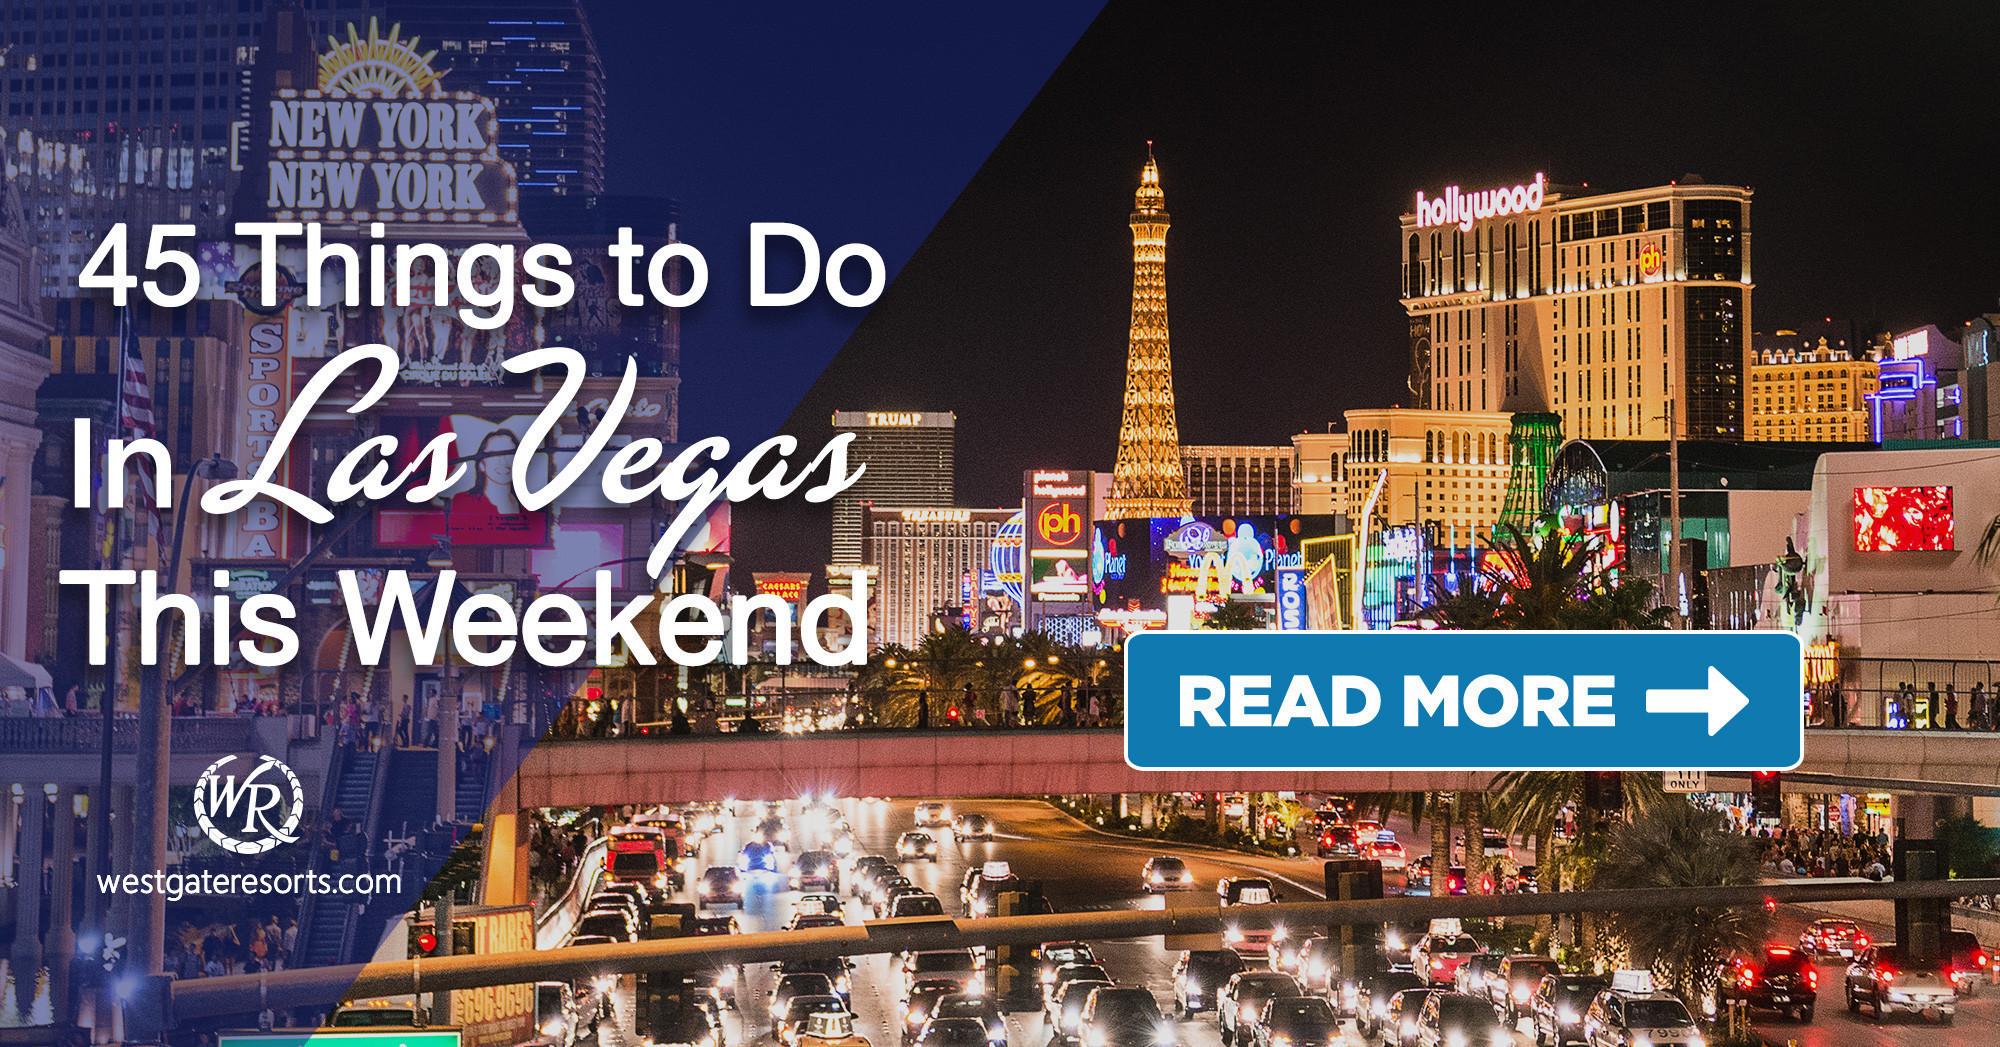 45 Things to Do in Las Vegas This Weekend